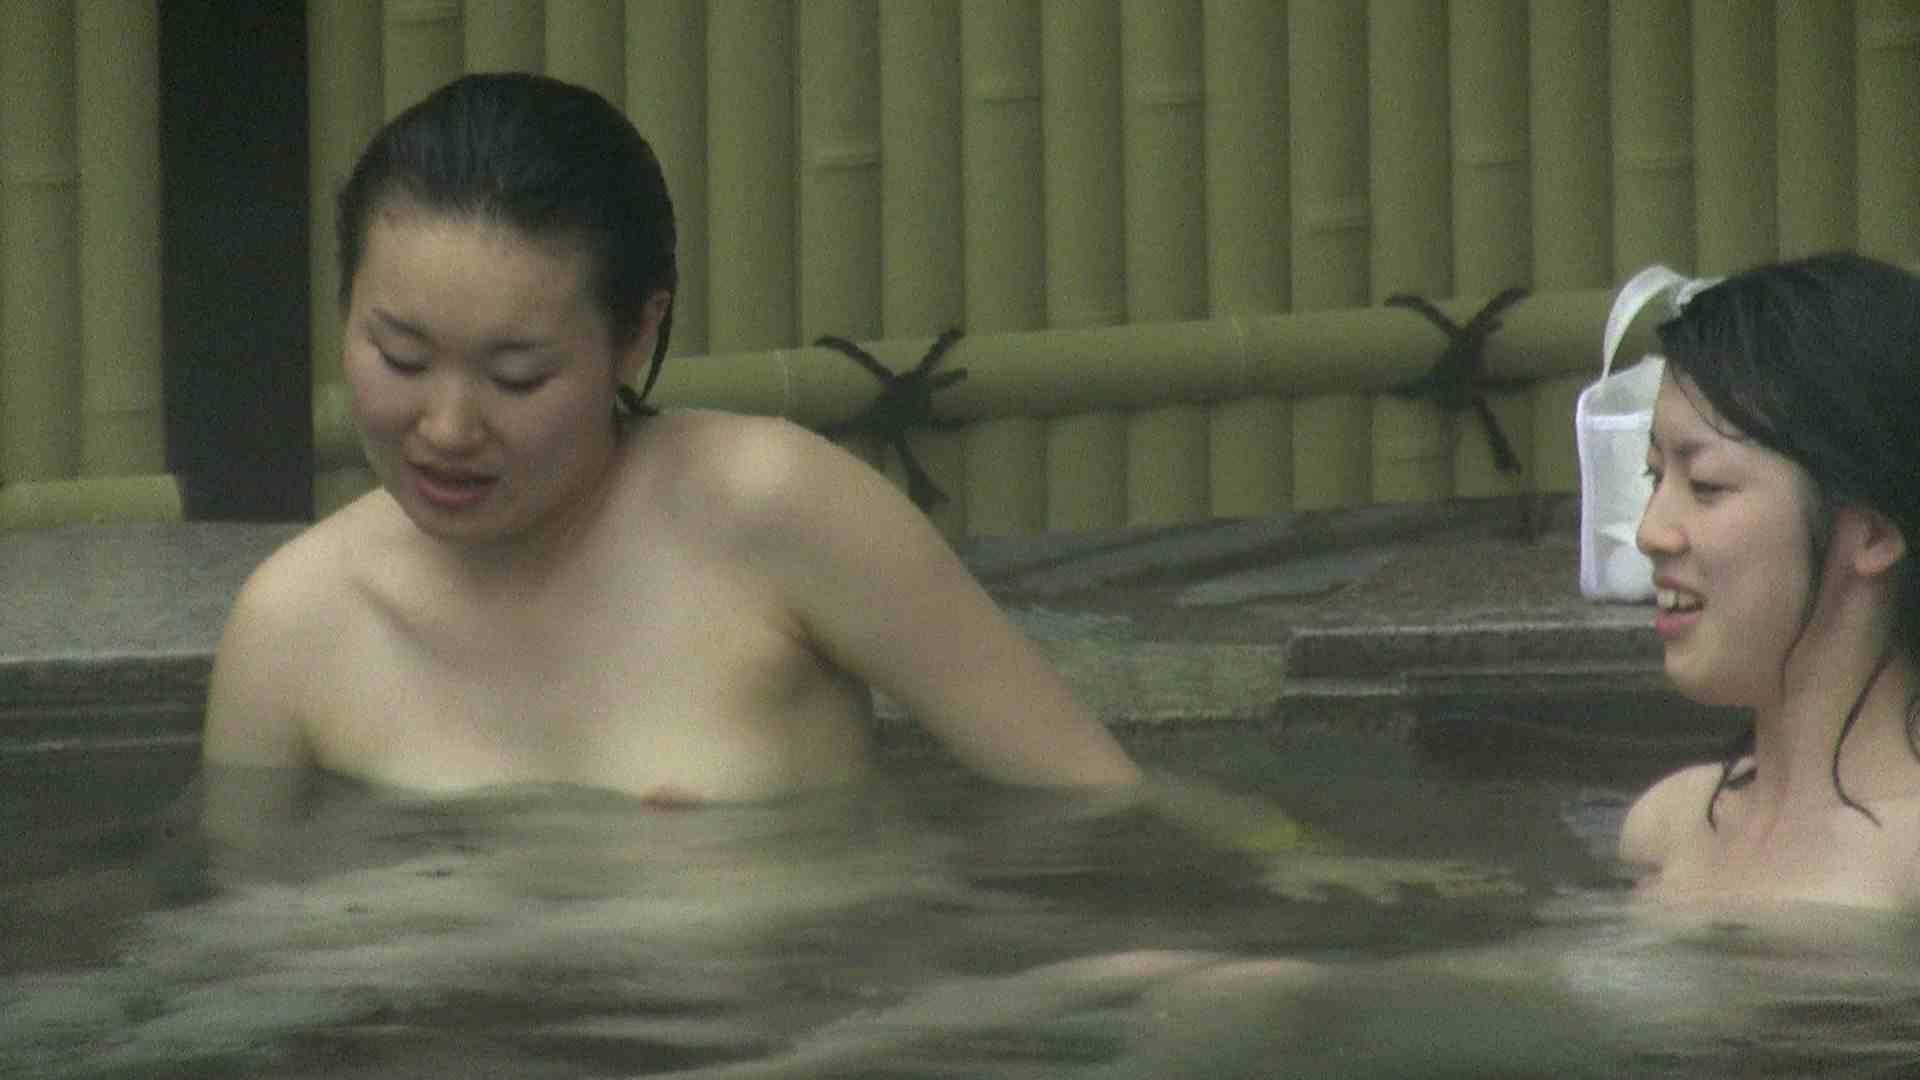 Aquaな露天風呂Vol.171 0  19連発 4